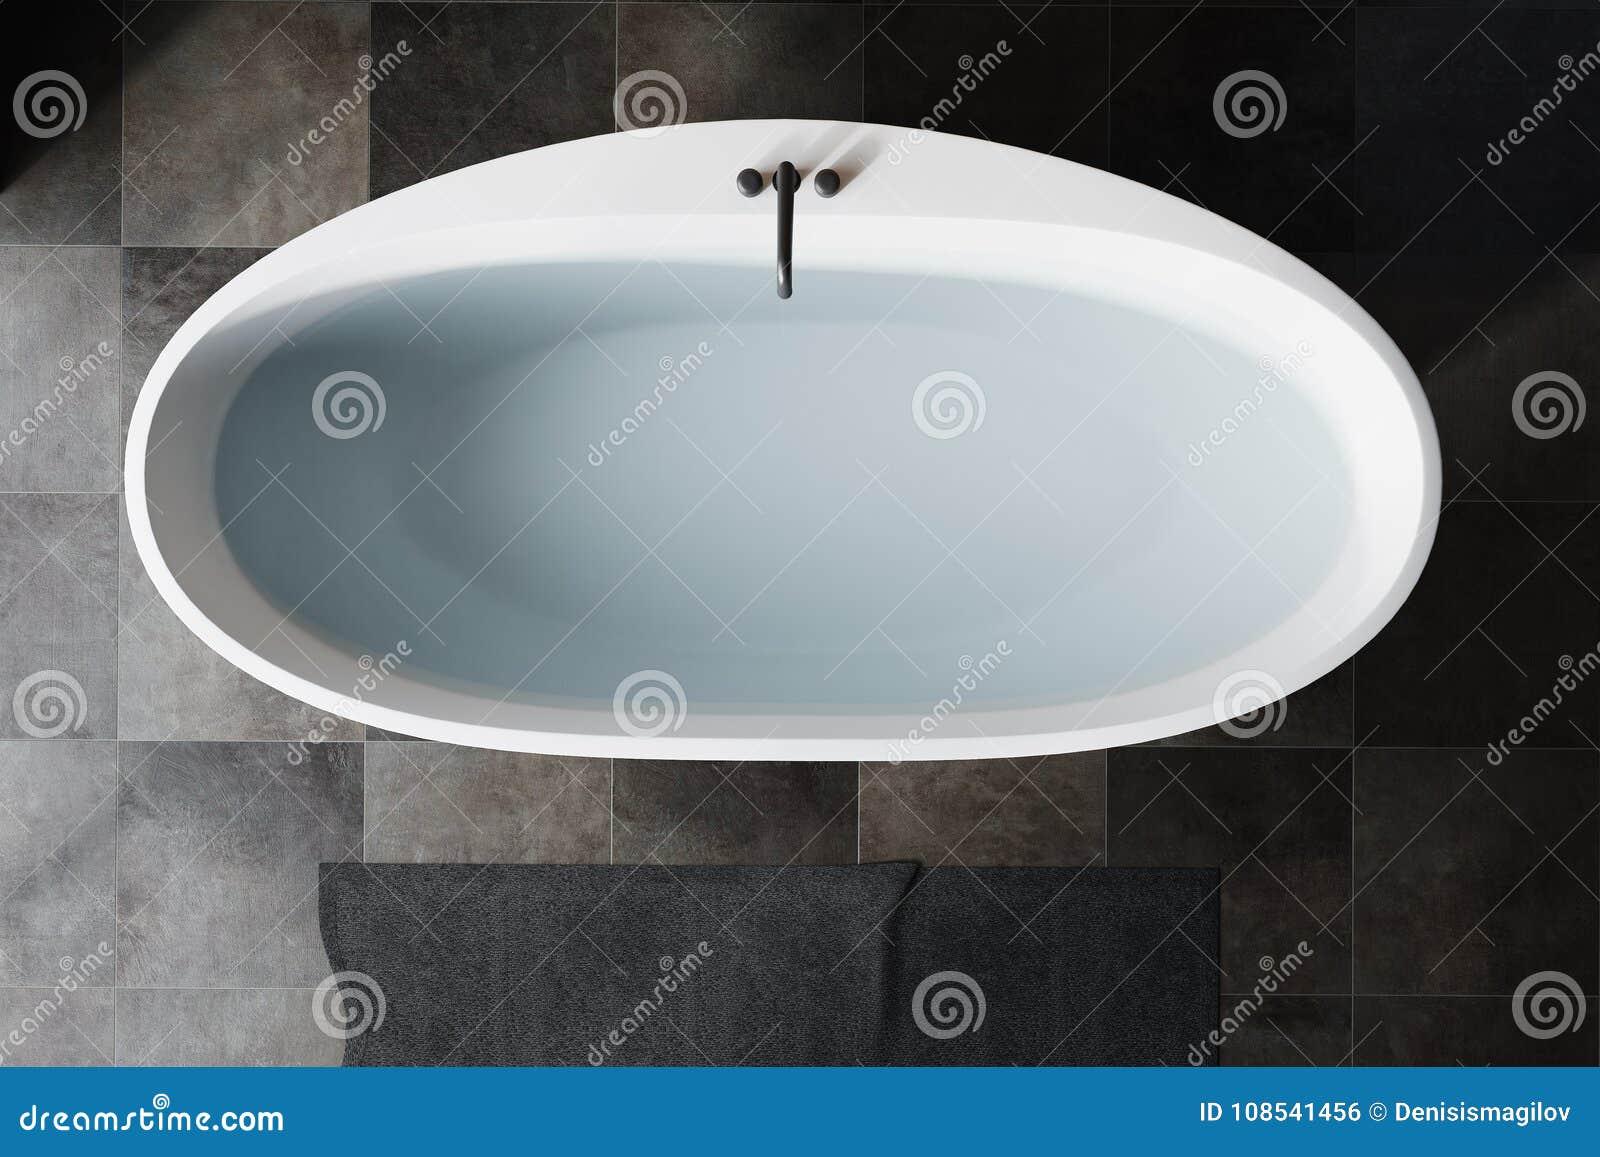 Black Bathroom White Tub Top View Stock Illustration - Illustration ...